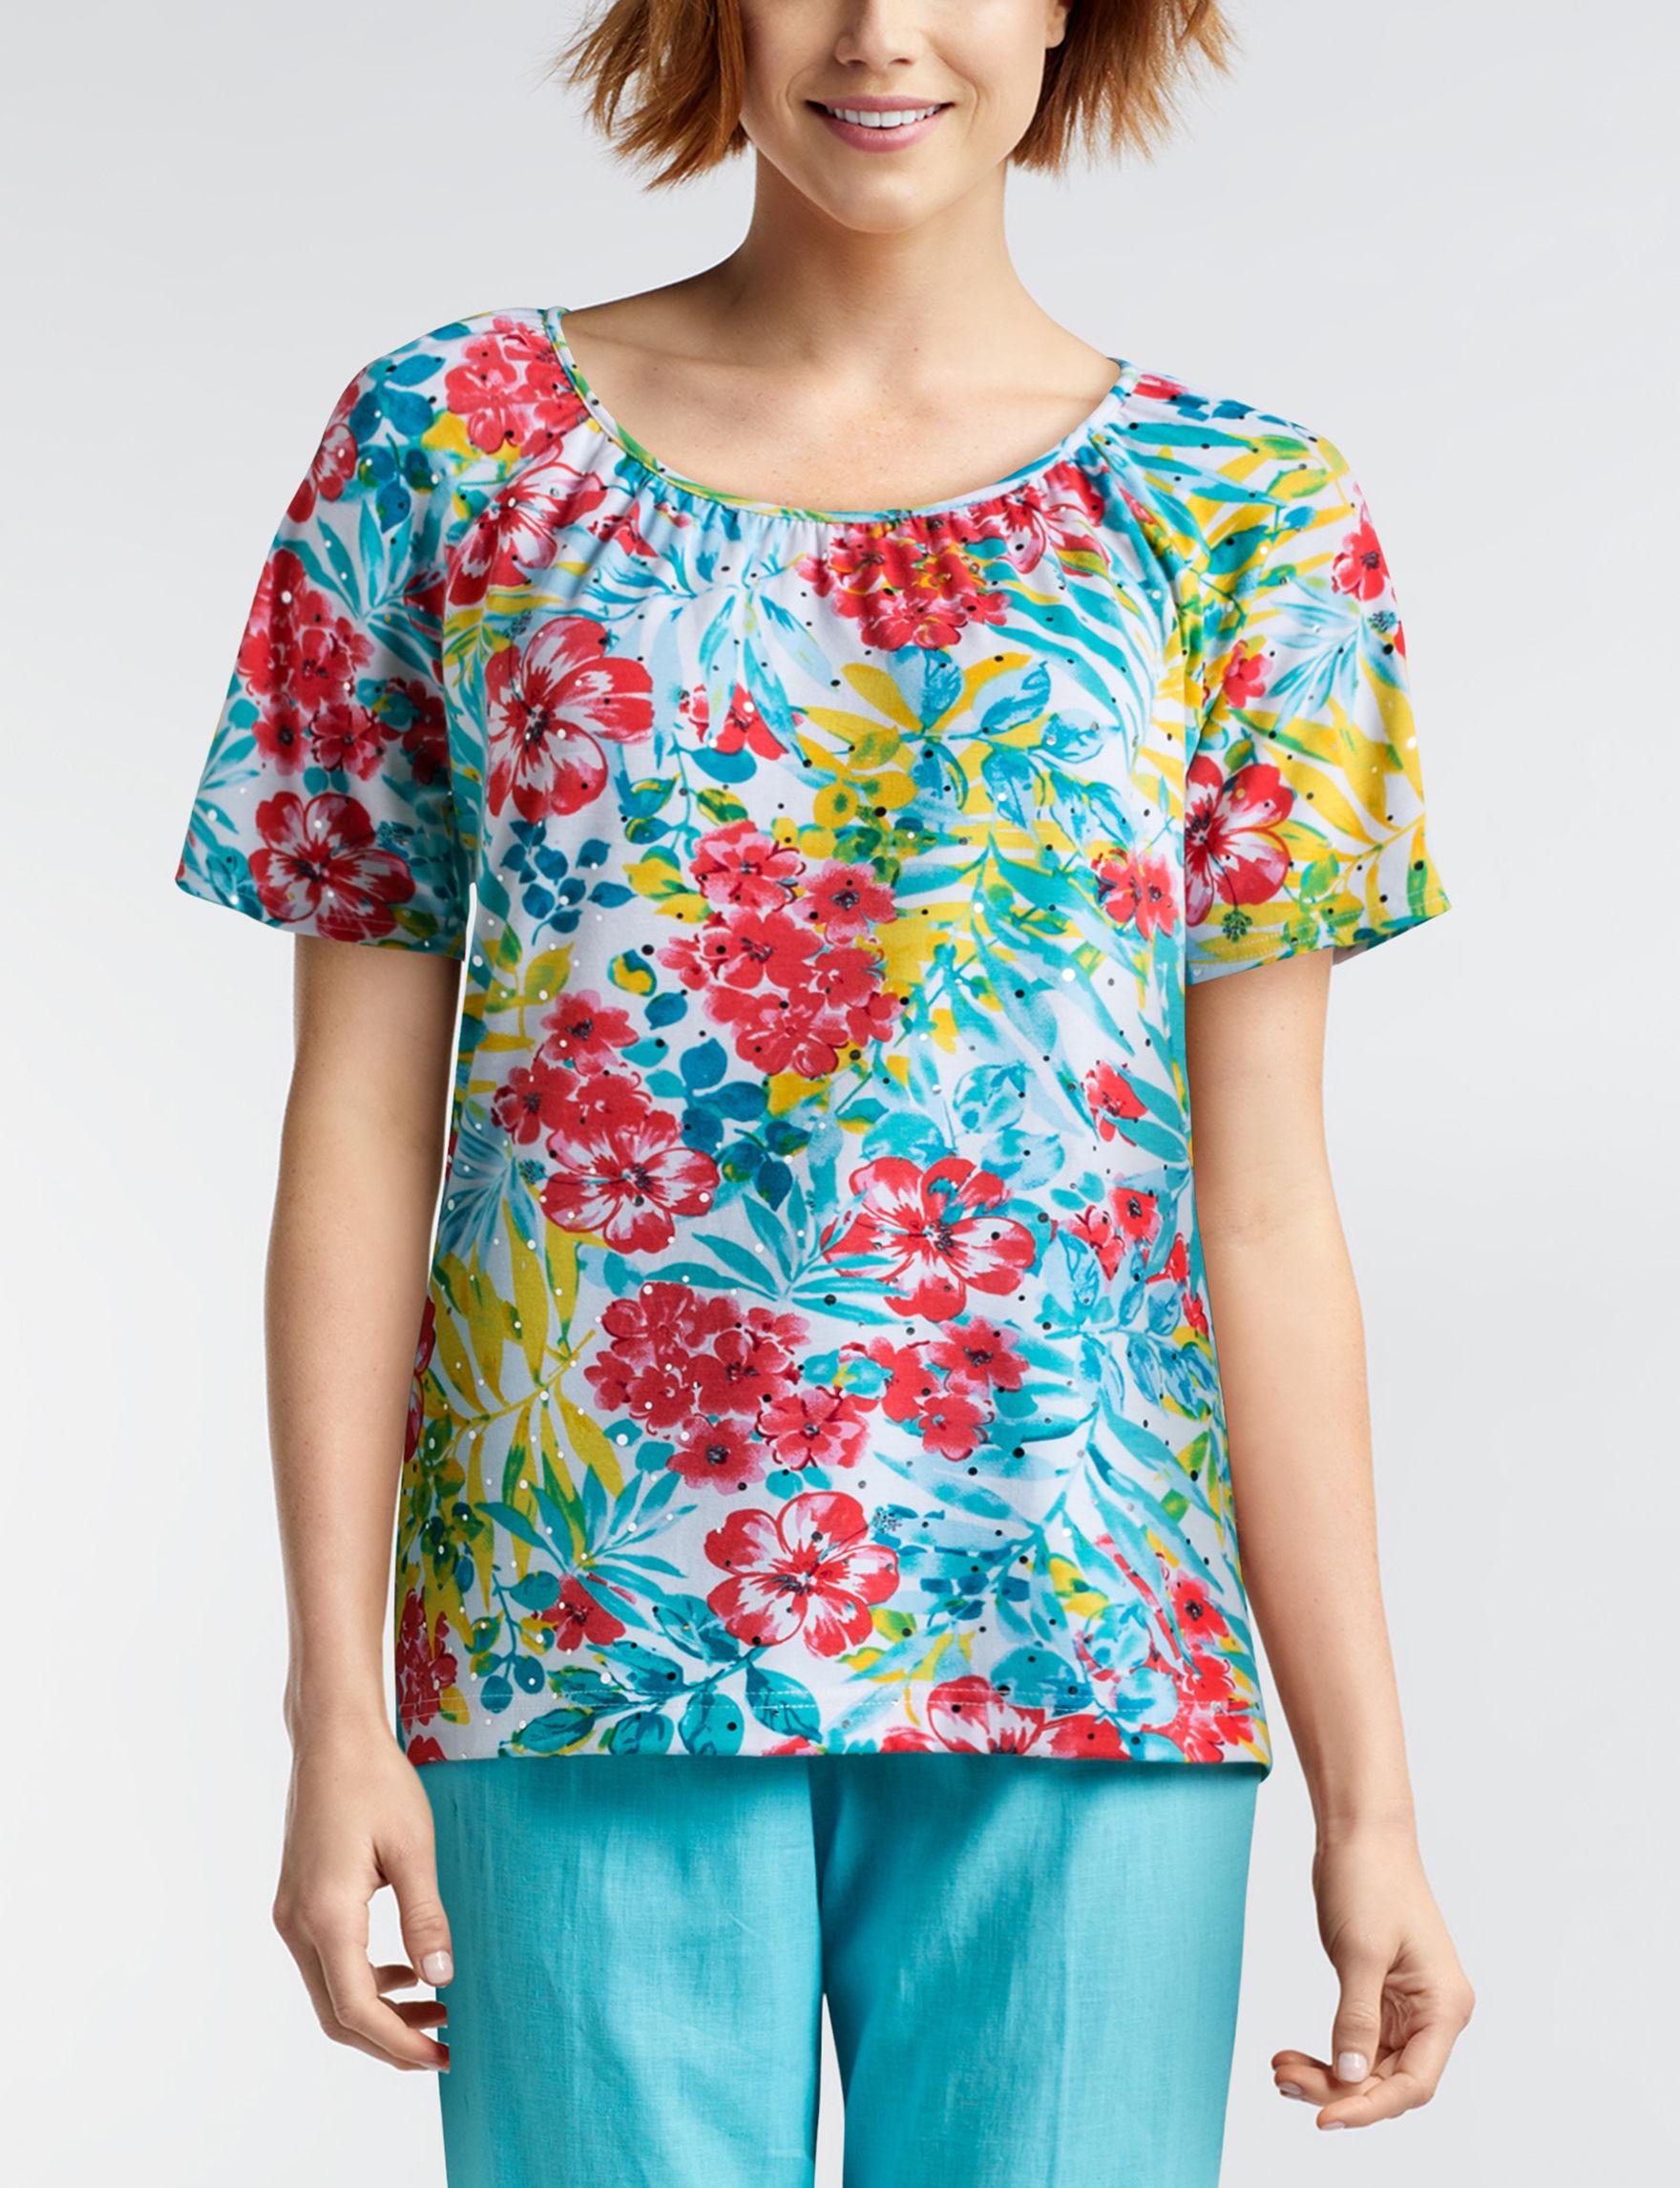 Rebecca Malone Blue Floral Shirts & Blouses